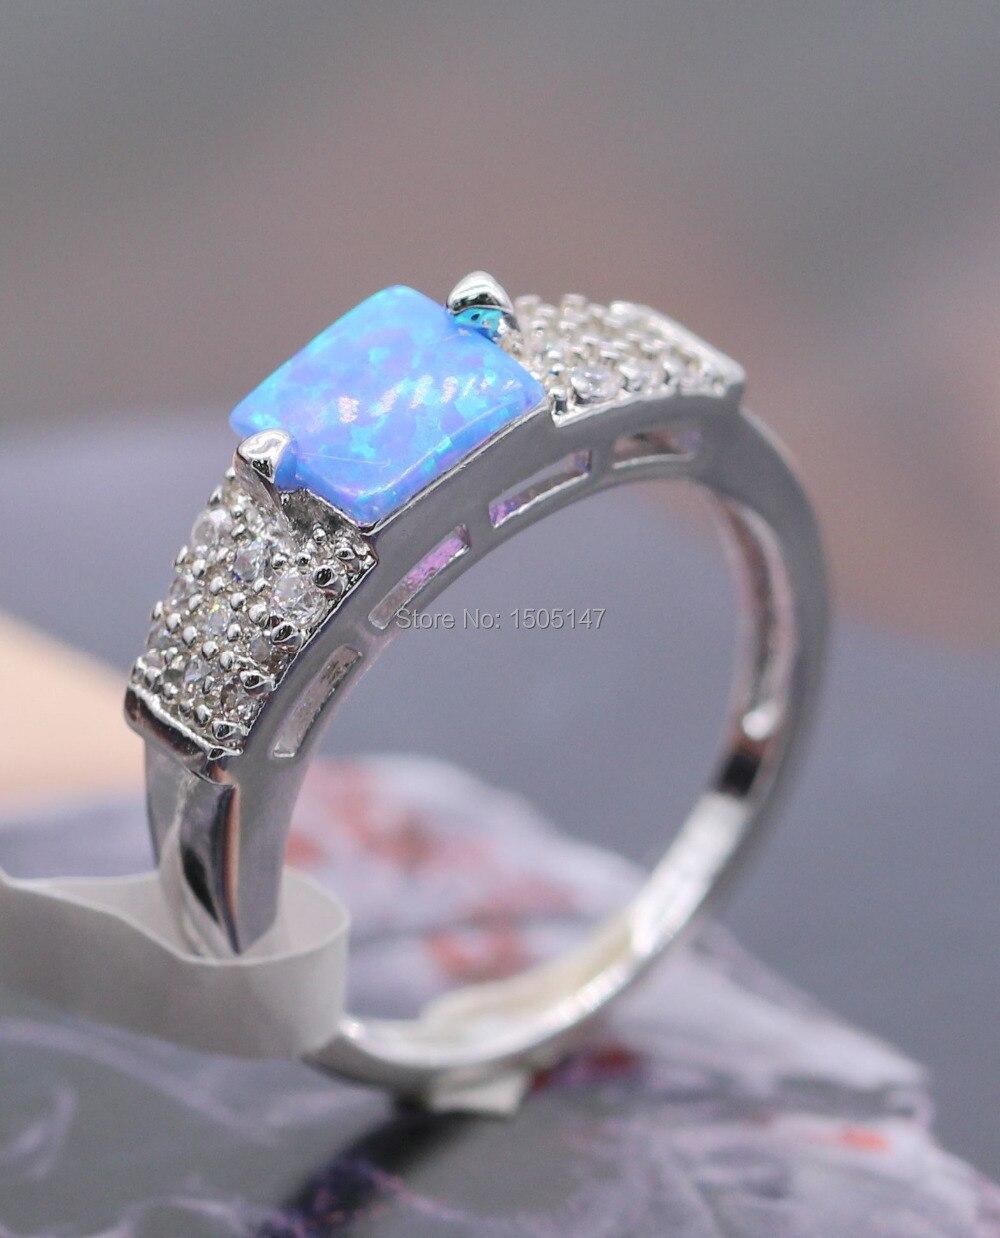 Noble Elegant Wholesale Women Jewelry bule/white/black Fire Opal Zircon Charm Stamp Ring size 6/7/8/9